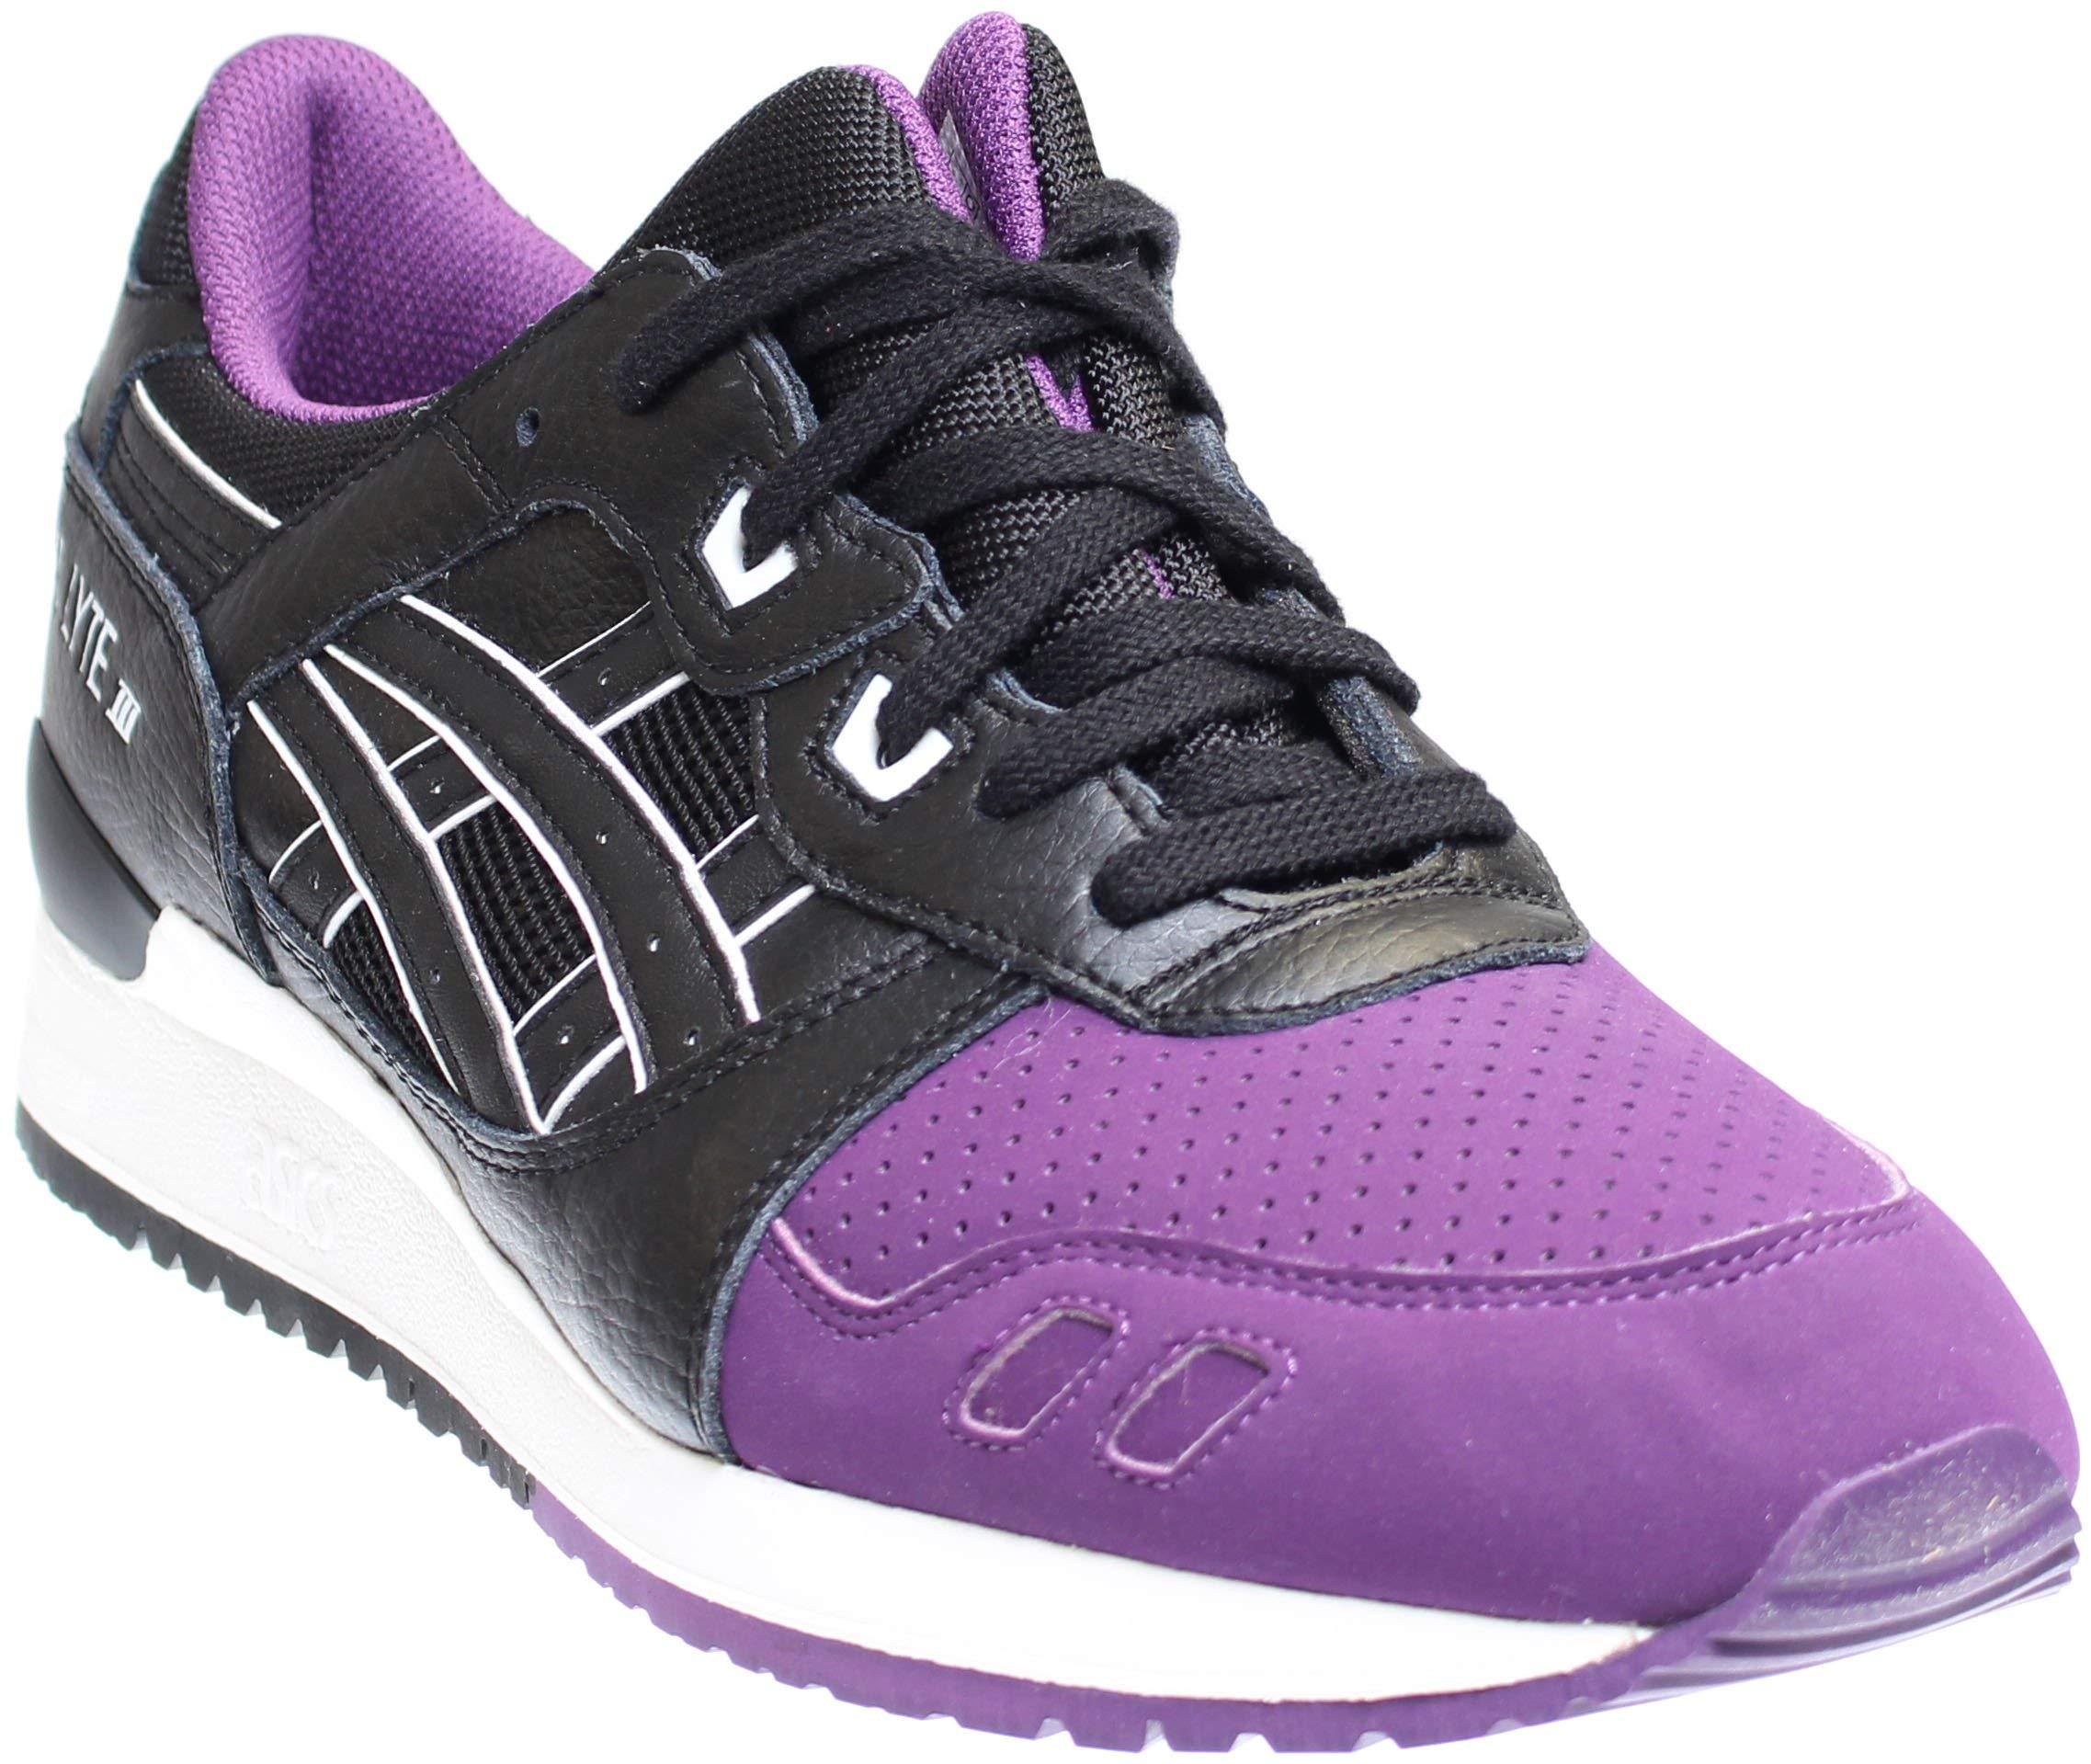 separation shoes d2cbc aae9b Galleon - ASICS Gel-Lyte III-U, Purple Black 8.5 D(M) US